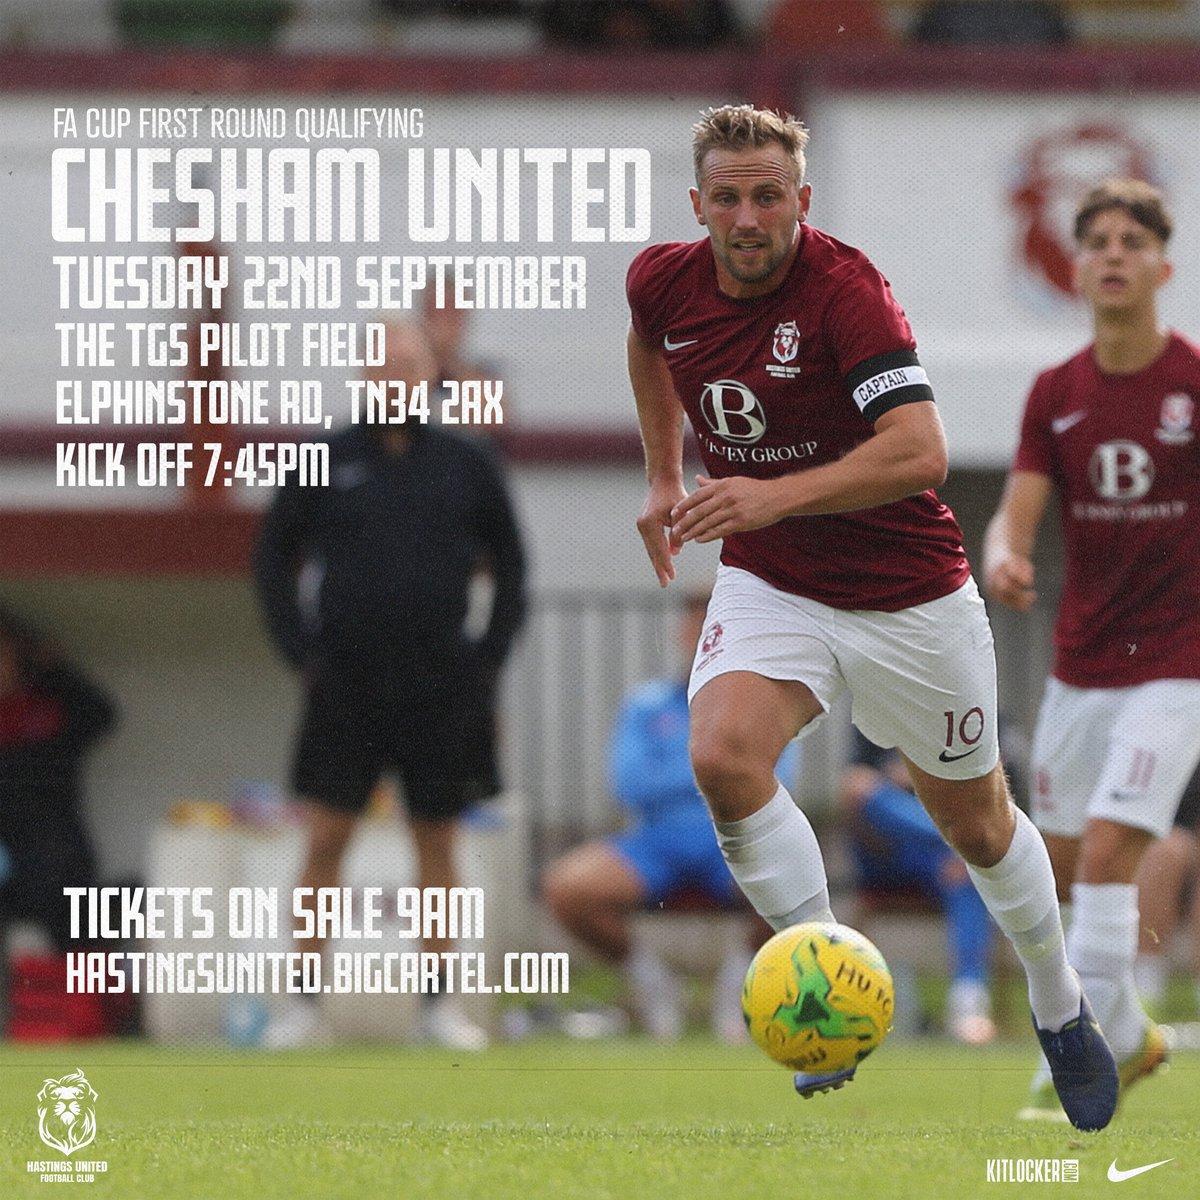 22nd Sept | Chesham United | FA Cup